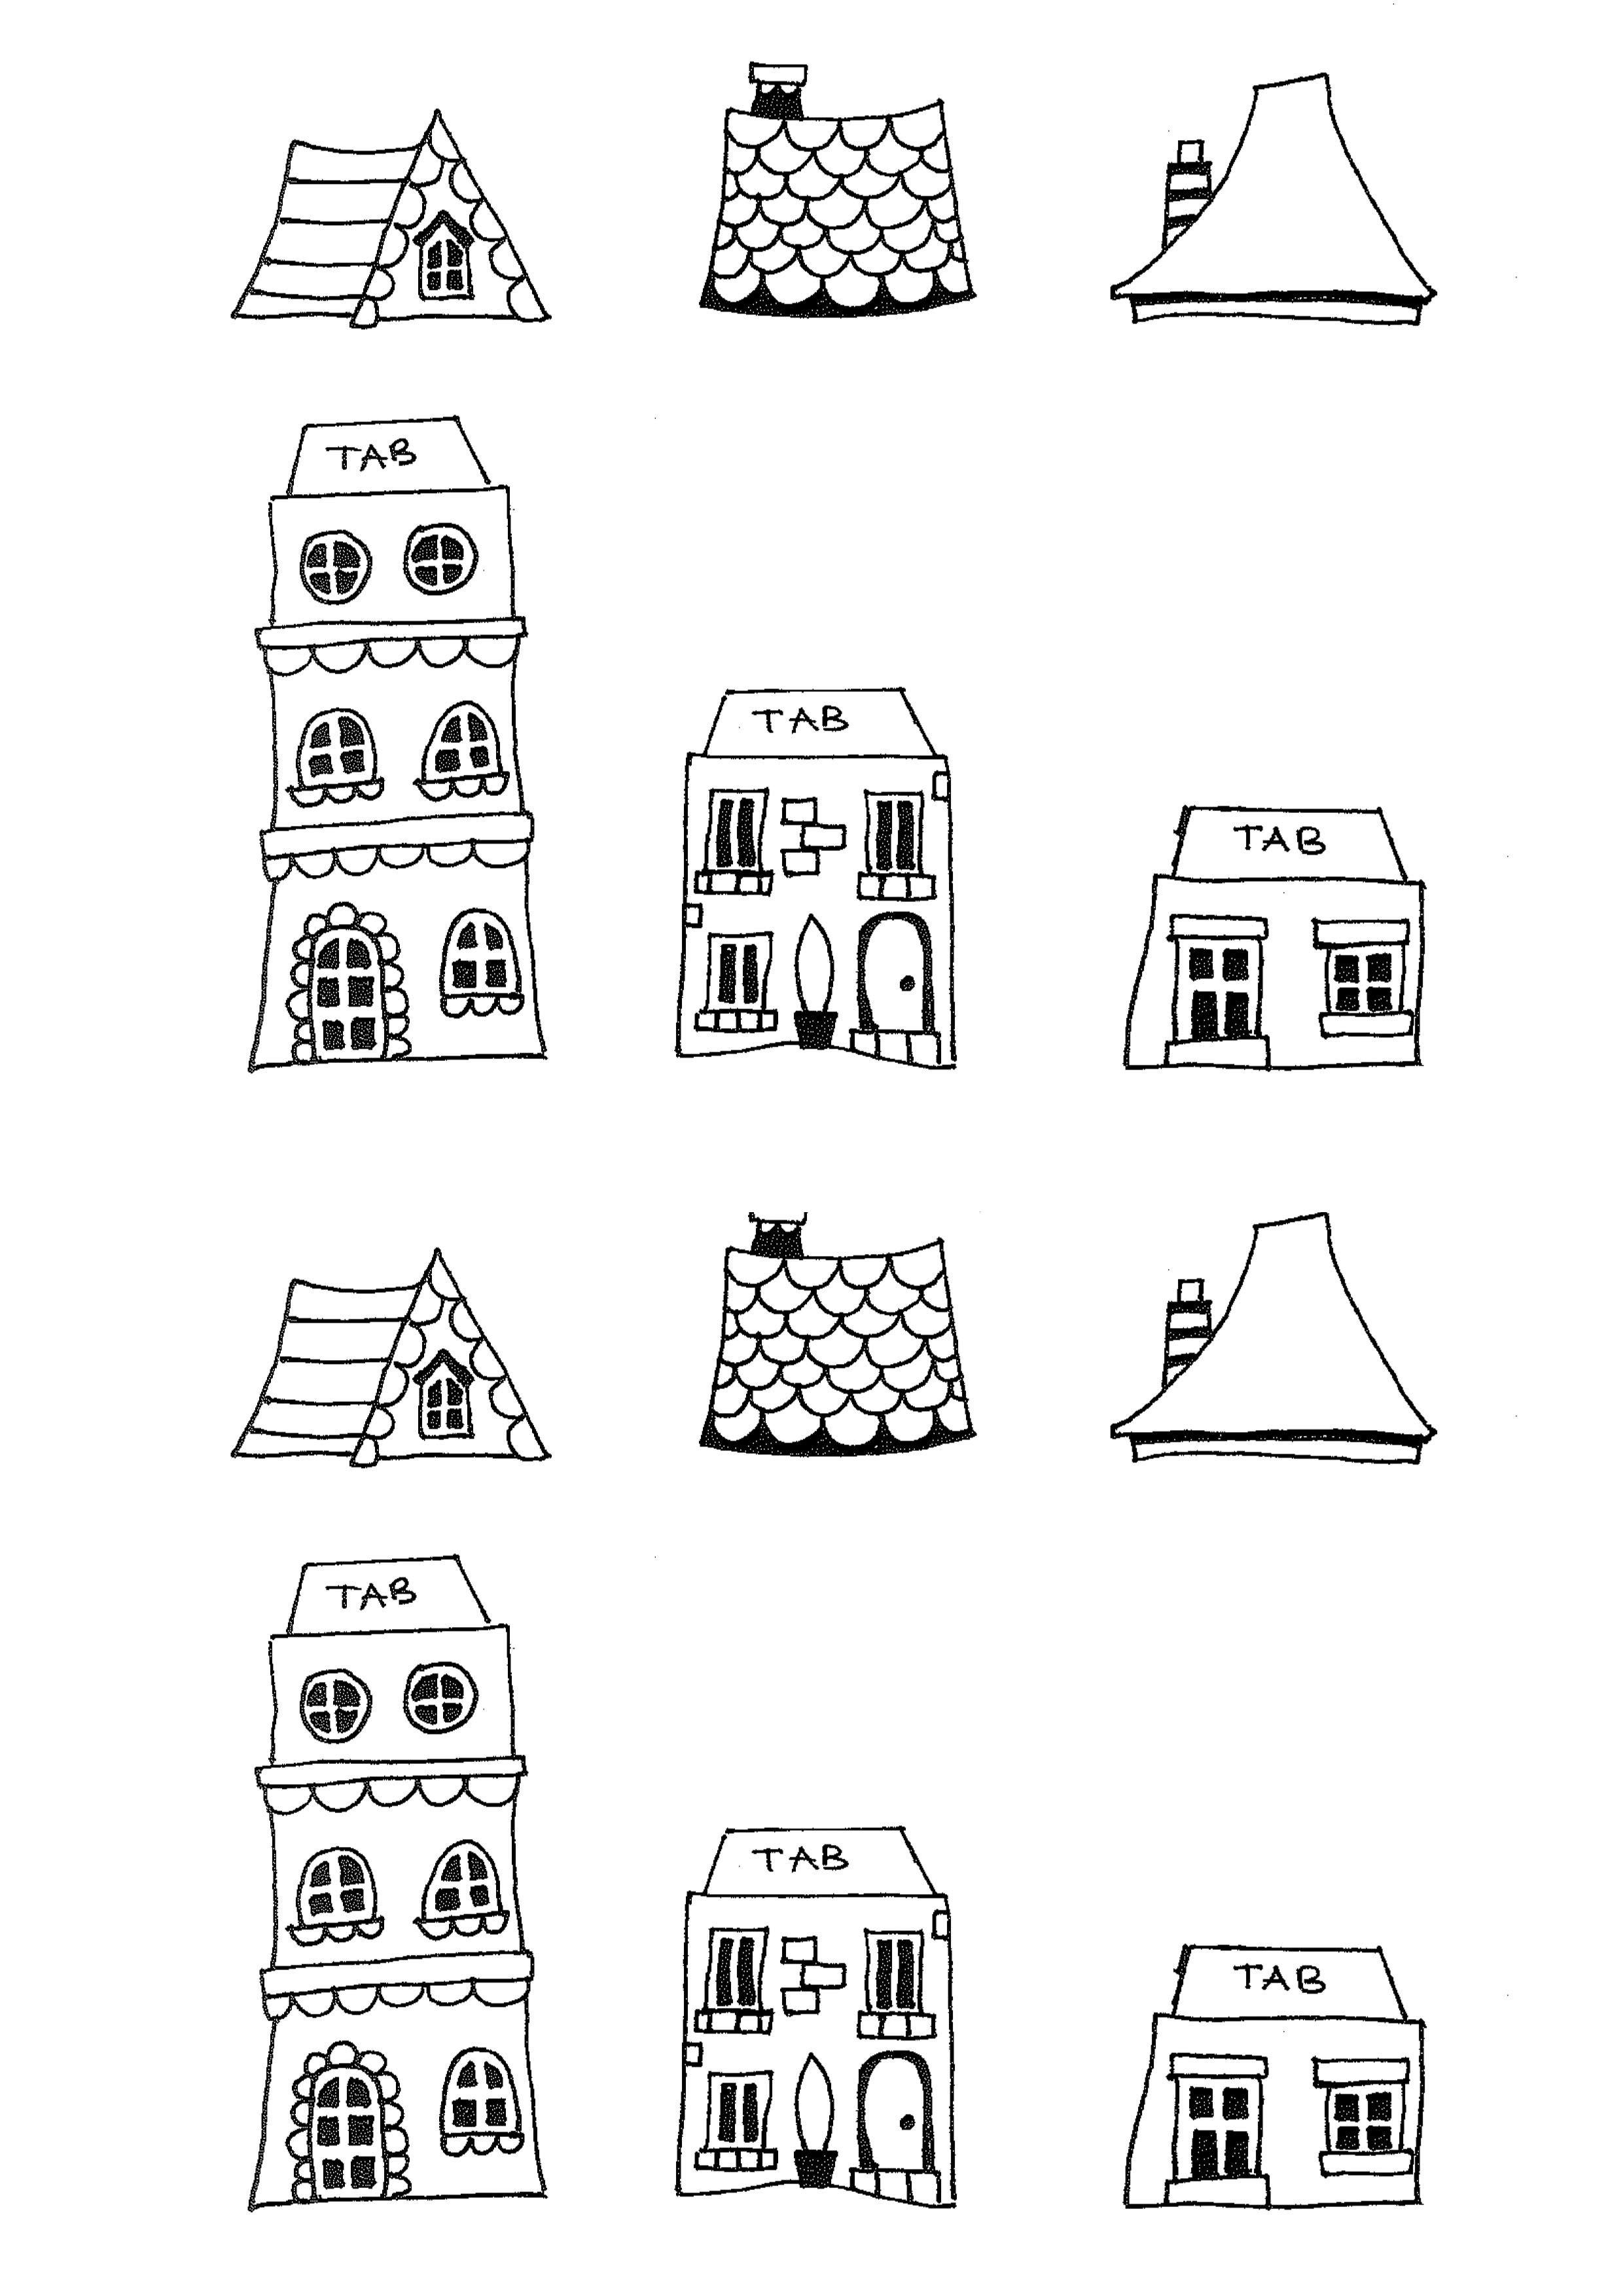 Free Printable House Templates | Printables | New Home Cards, House - Free Printable Card Templates